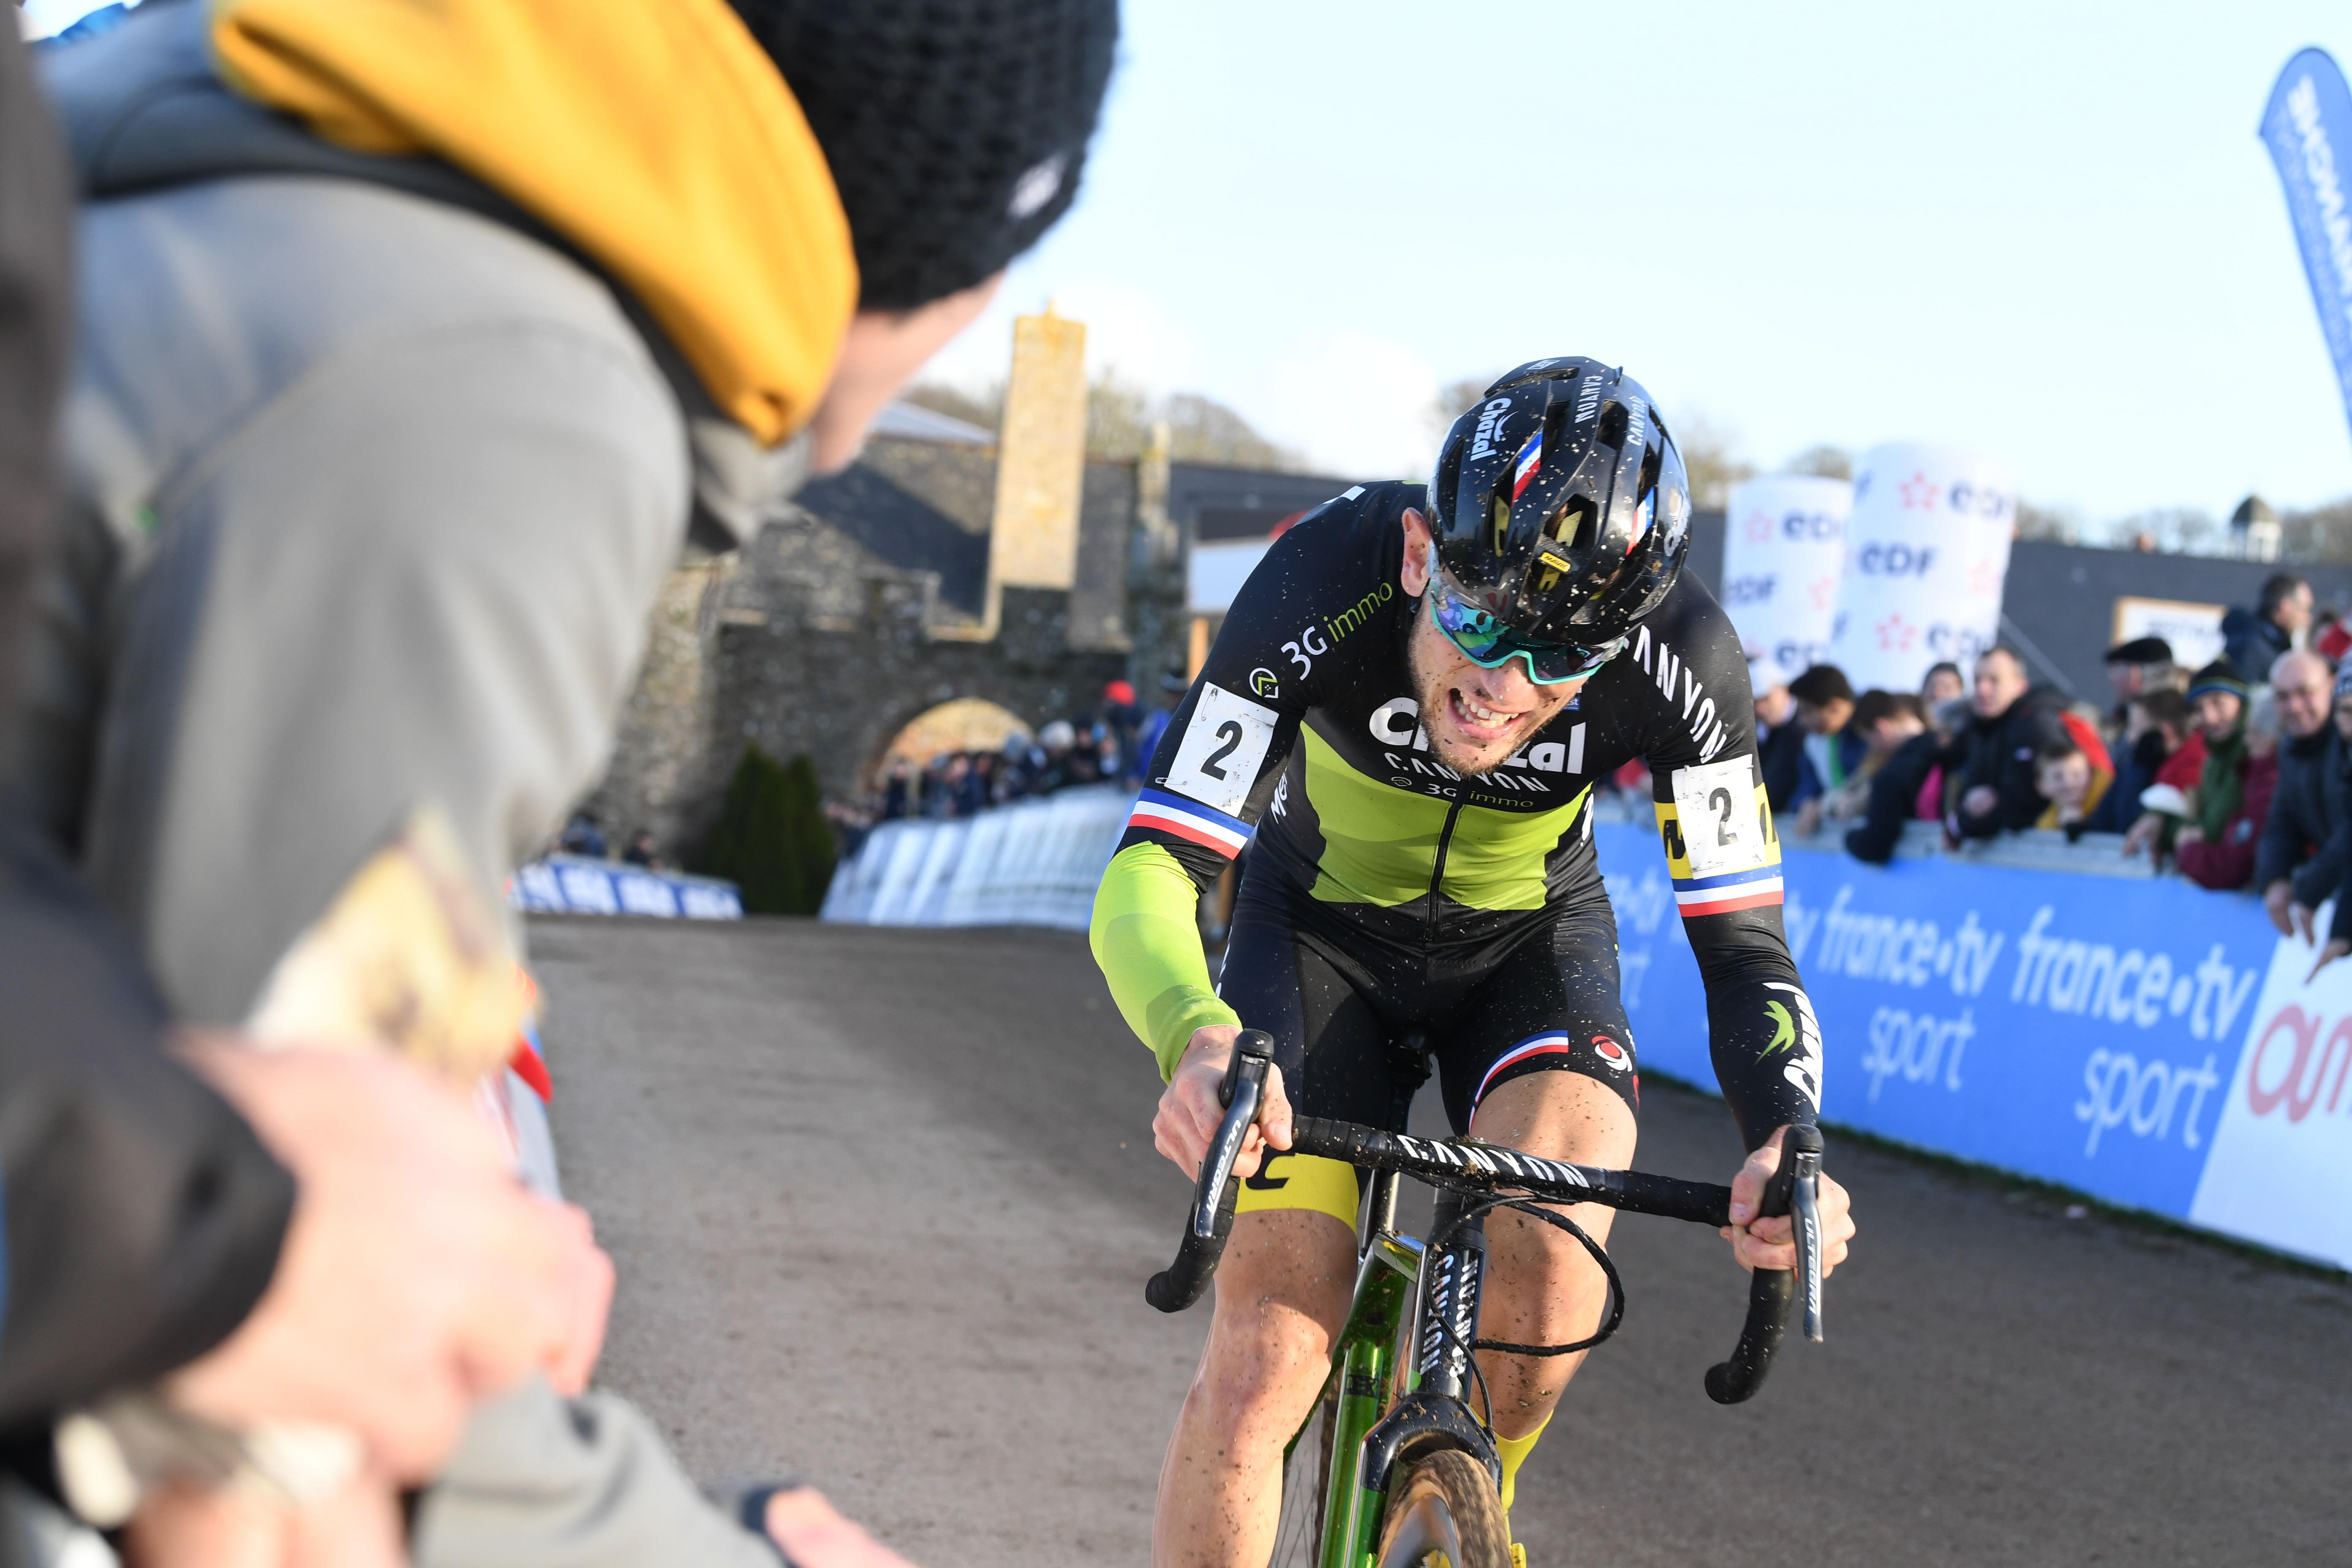 France Cyclisme